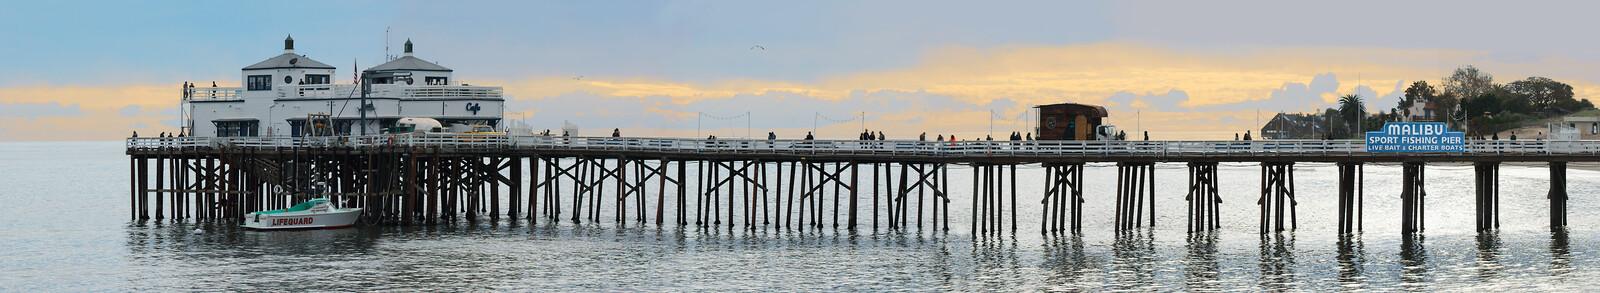 Malibu Pier - Larry Yust